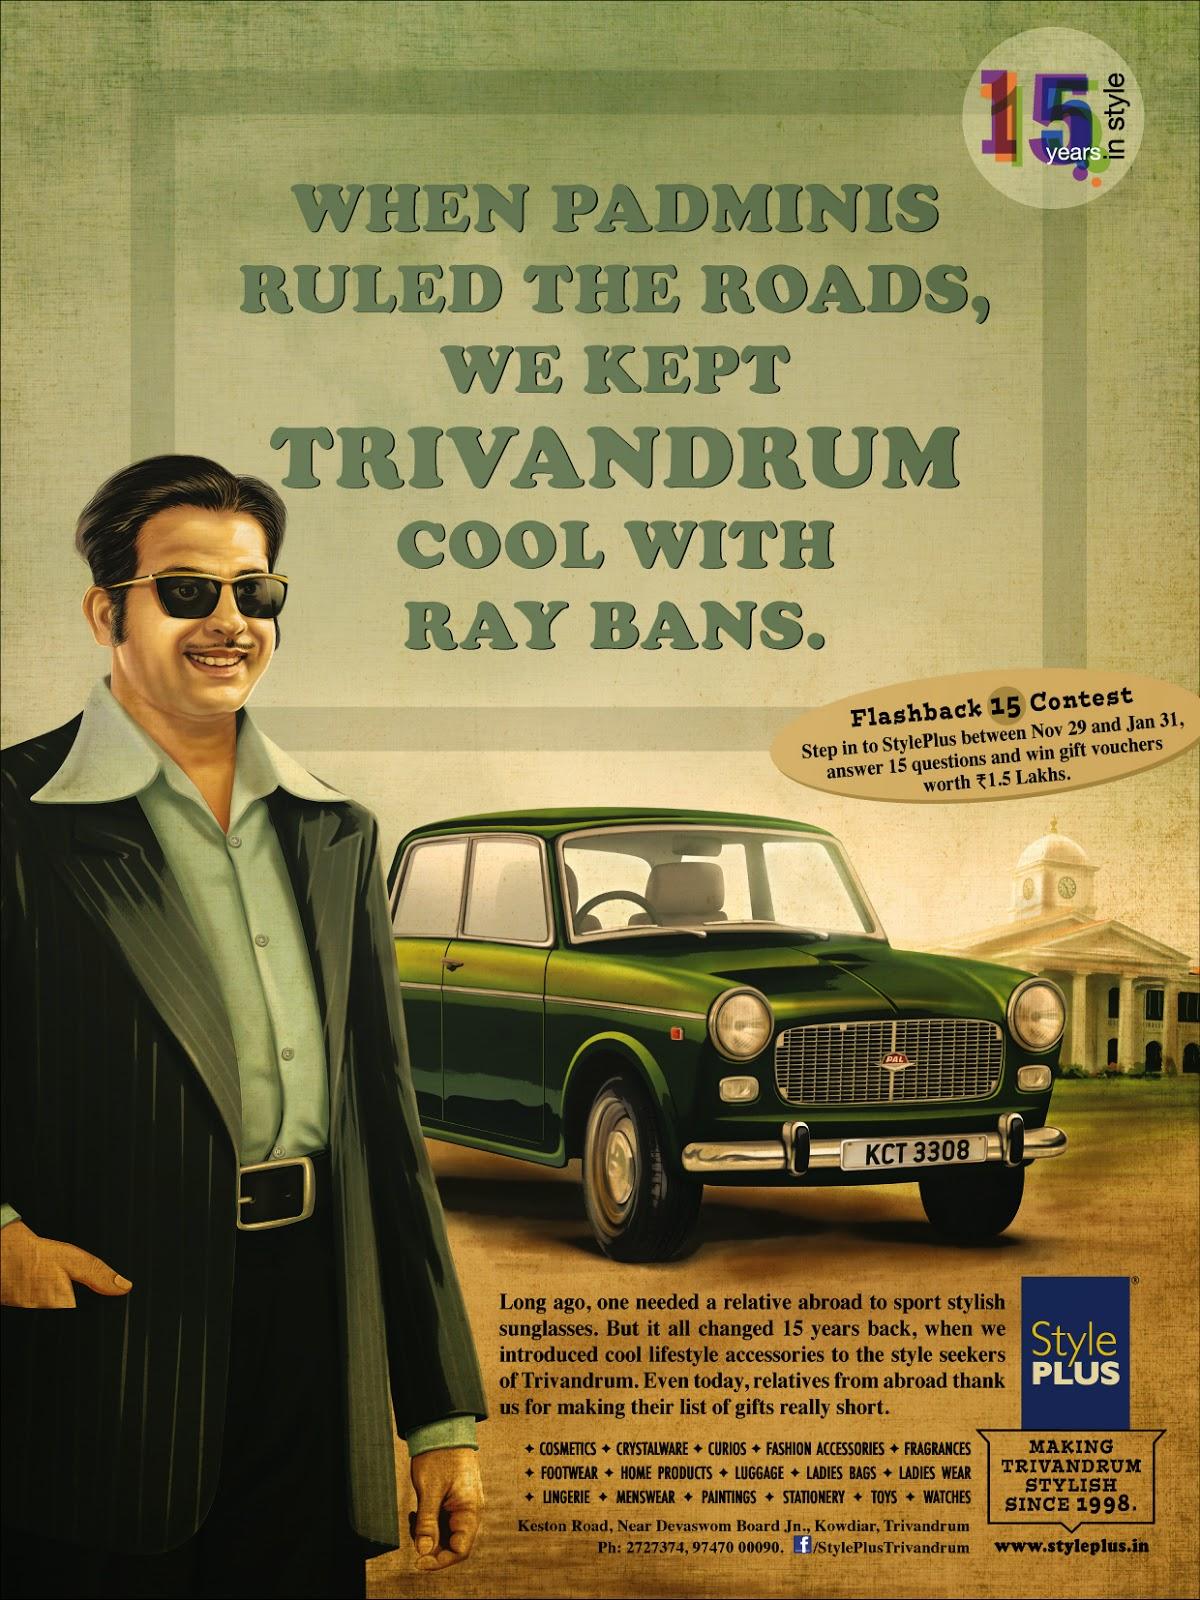 15 Years of Style Plus   Trivandrum's trendsetters 1   Stark Communications Pvt Ltd